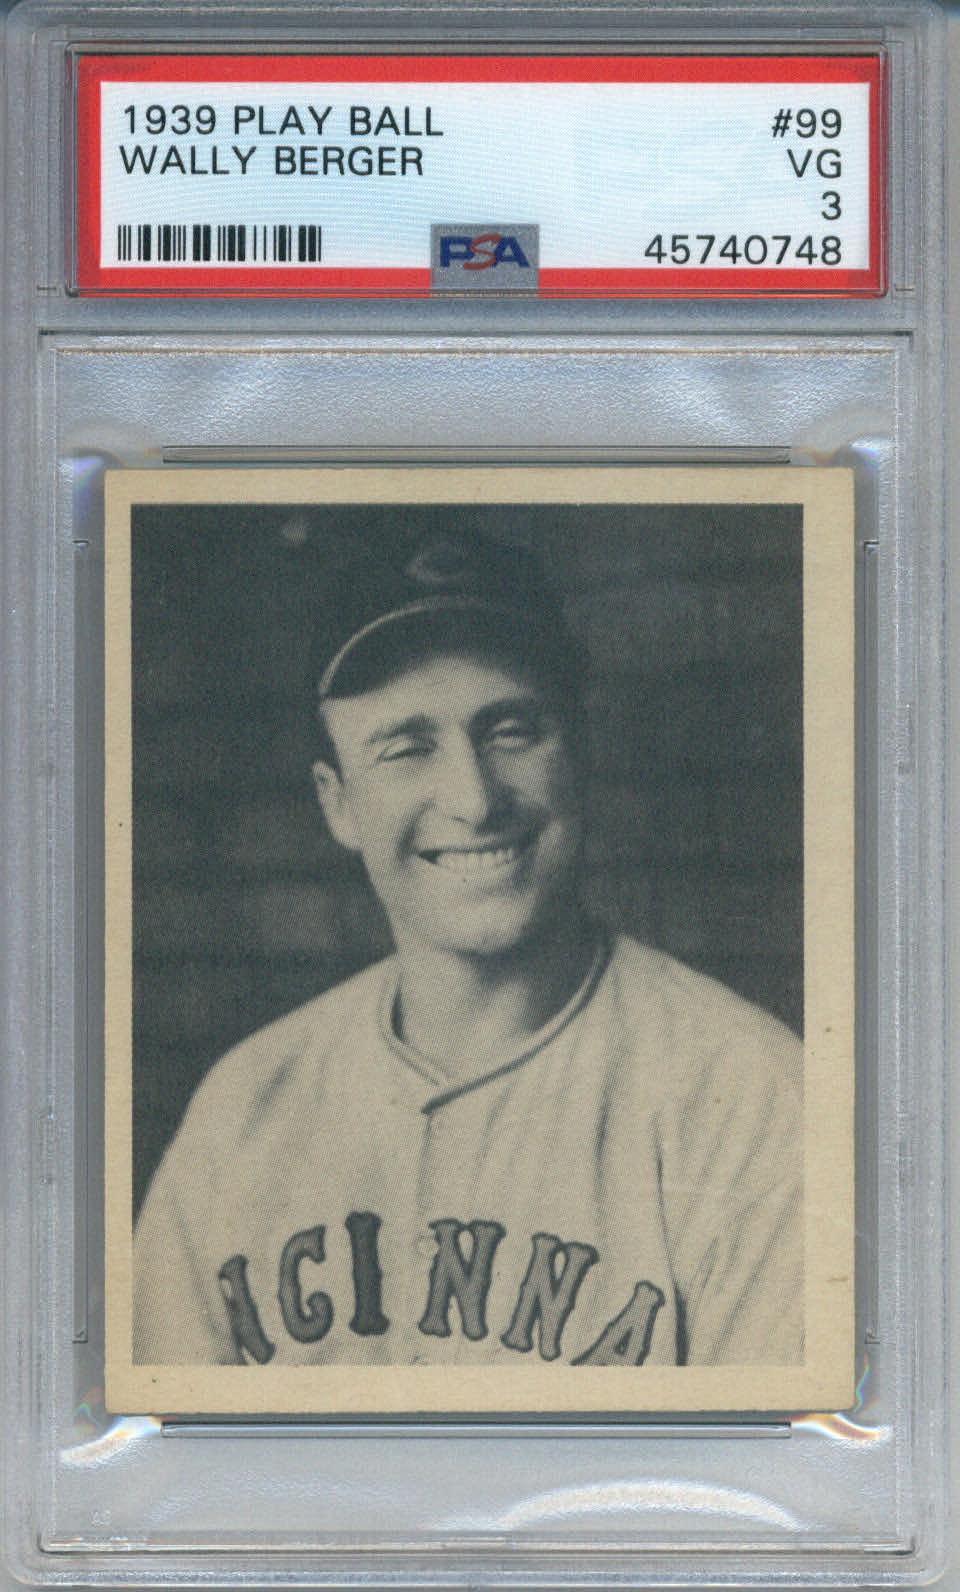 1939 Play Ball #99 Wally Berger PSA 3